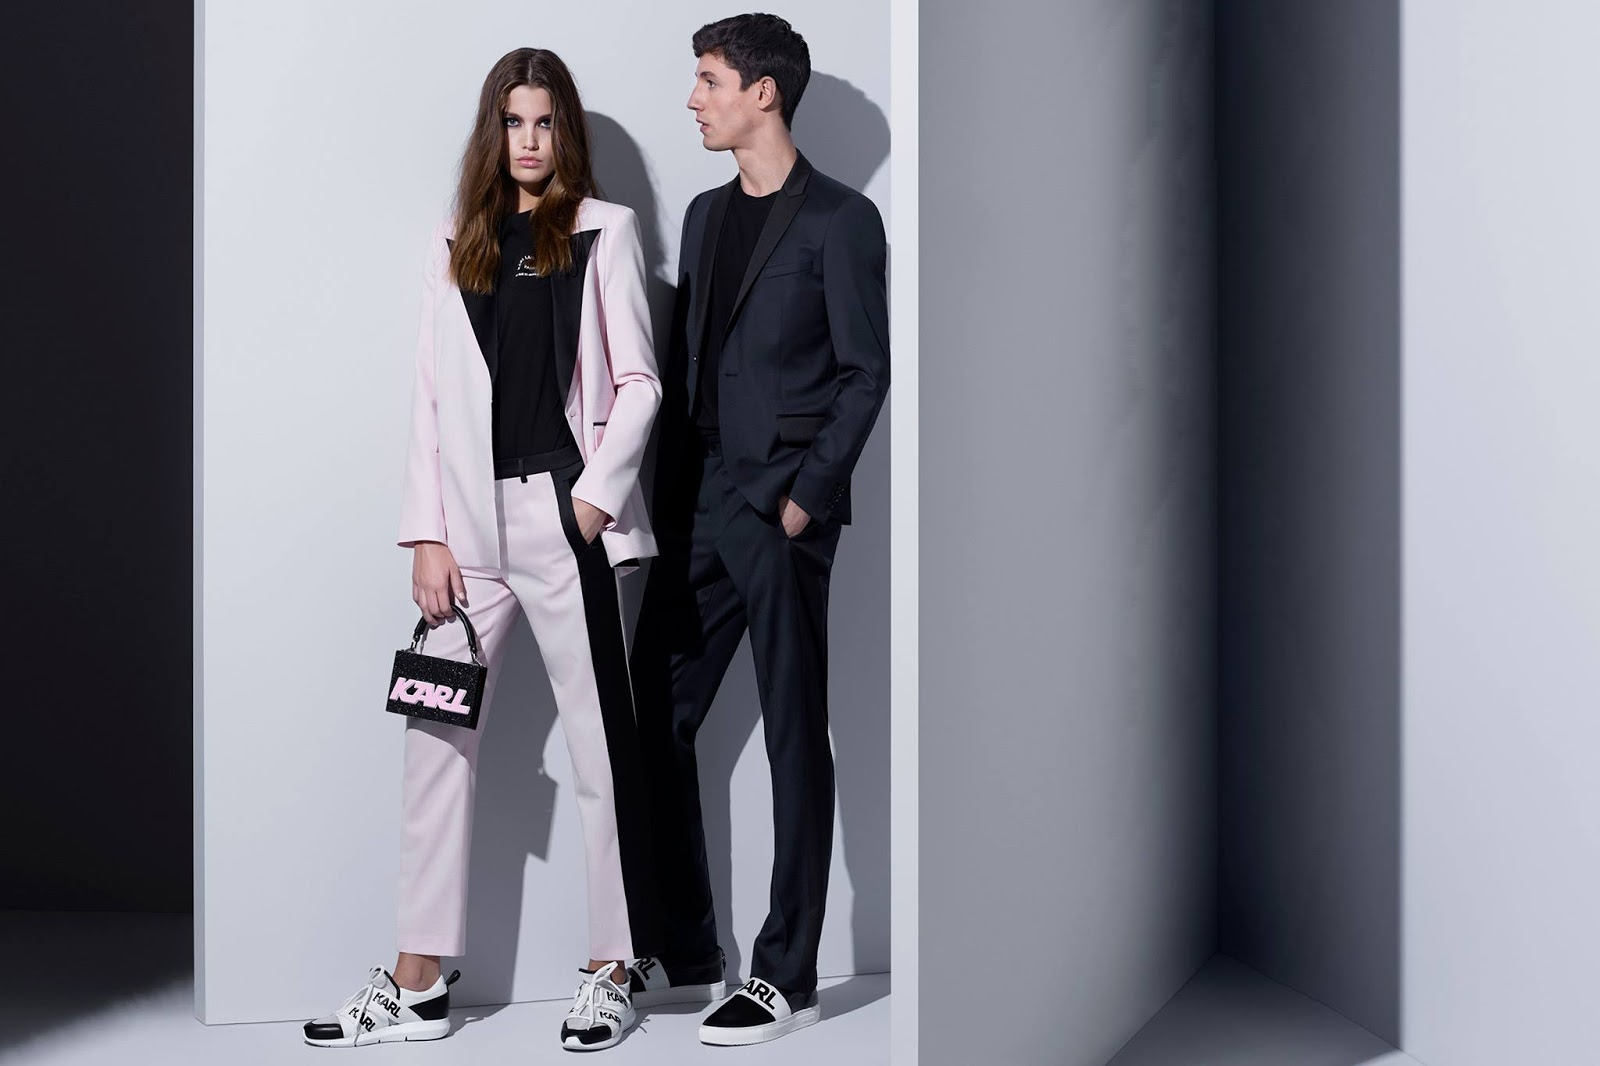 Karl Lagerfeld Spring/Summer 2018 Campaign featuring Luna Bijl